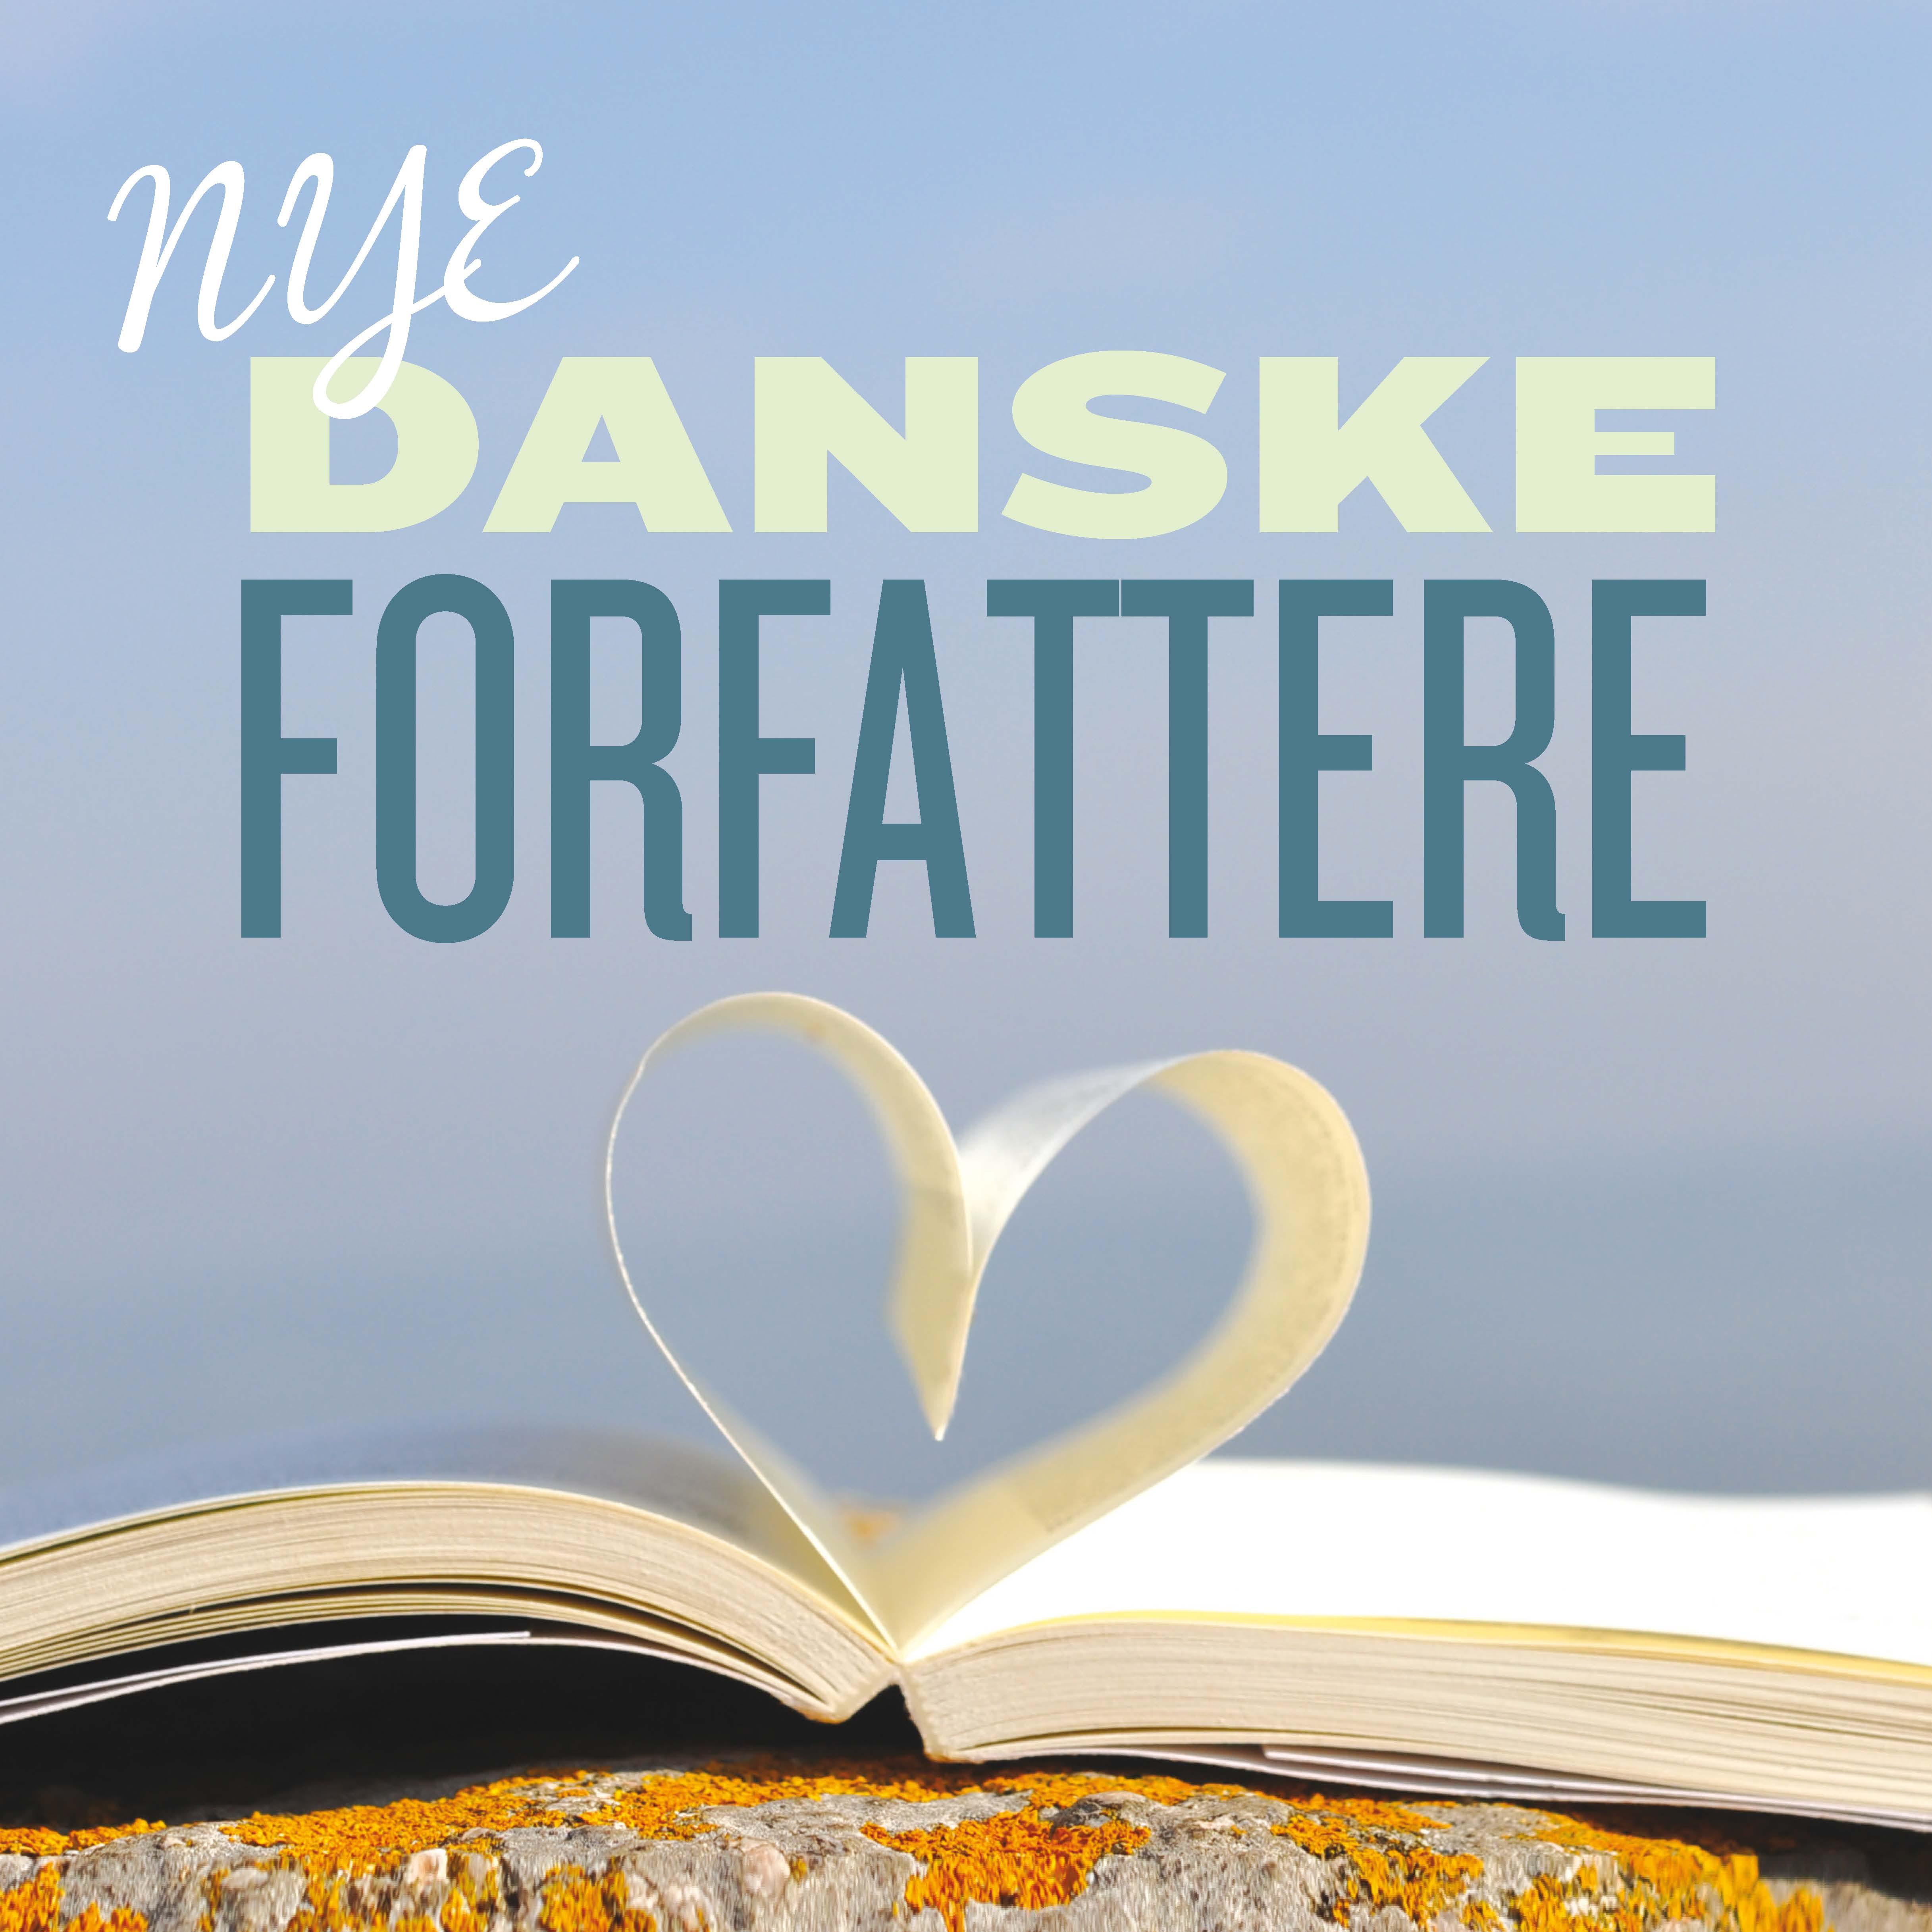 nyudkomne danske bøger